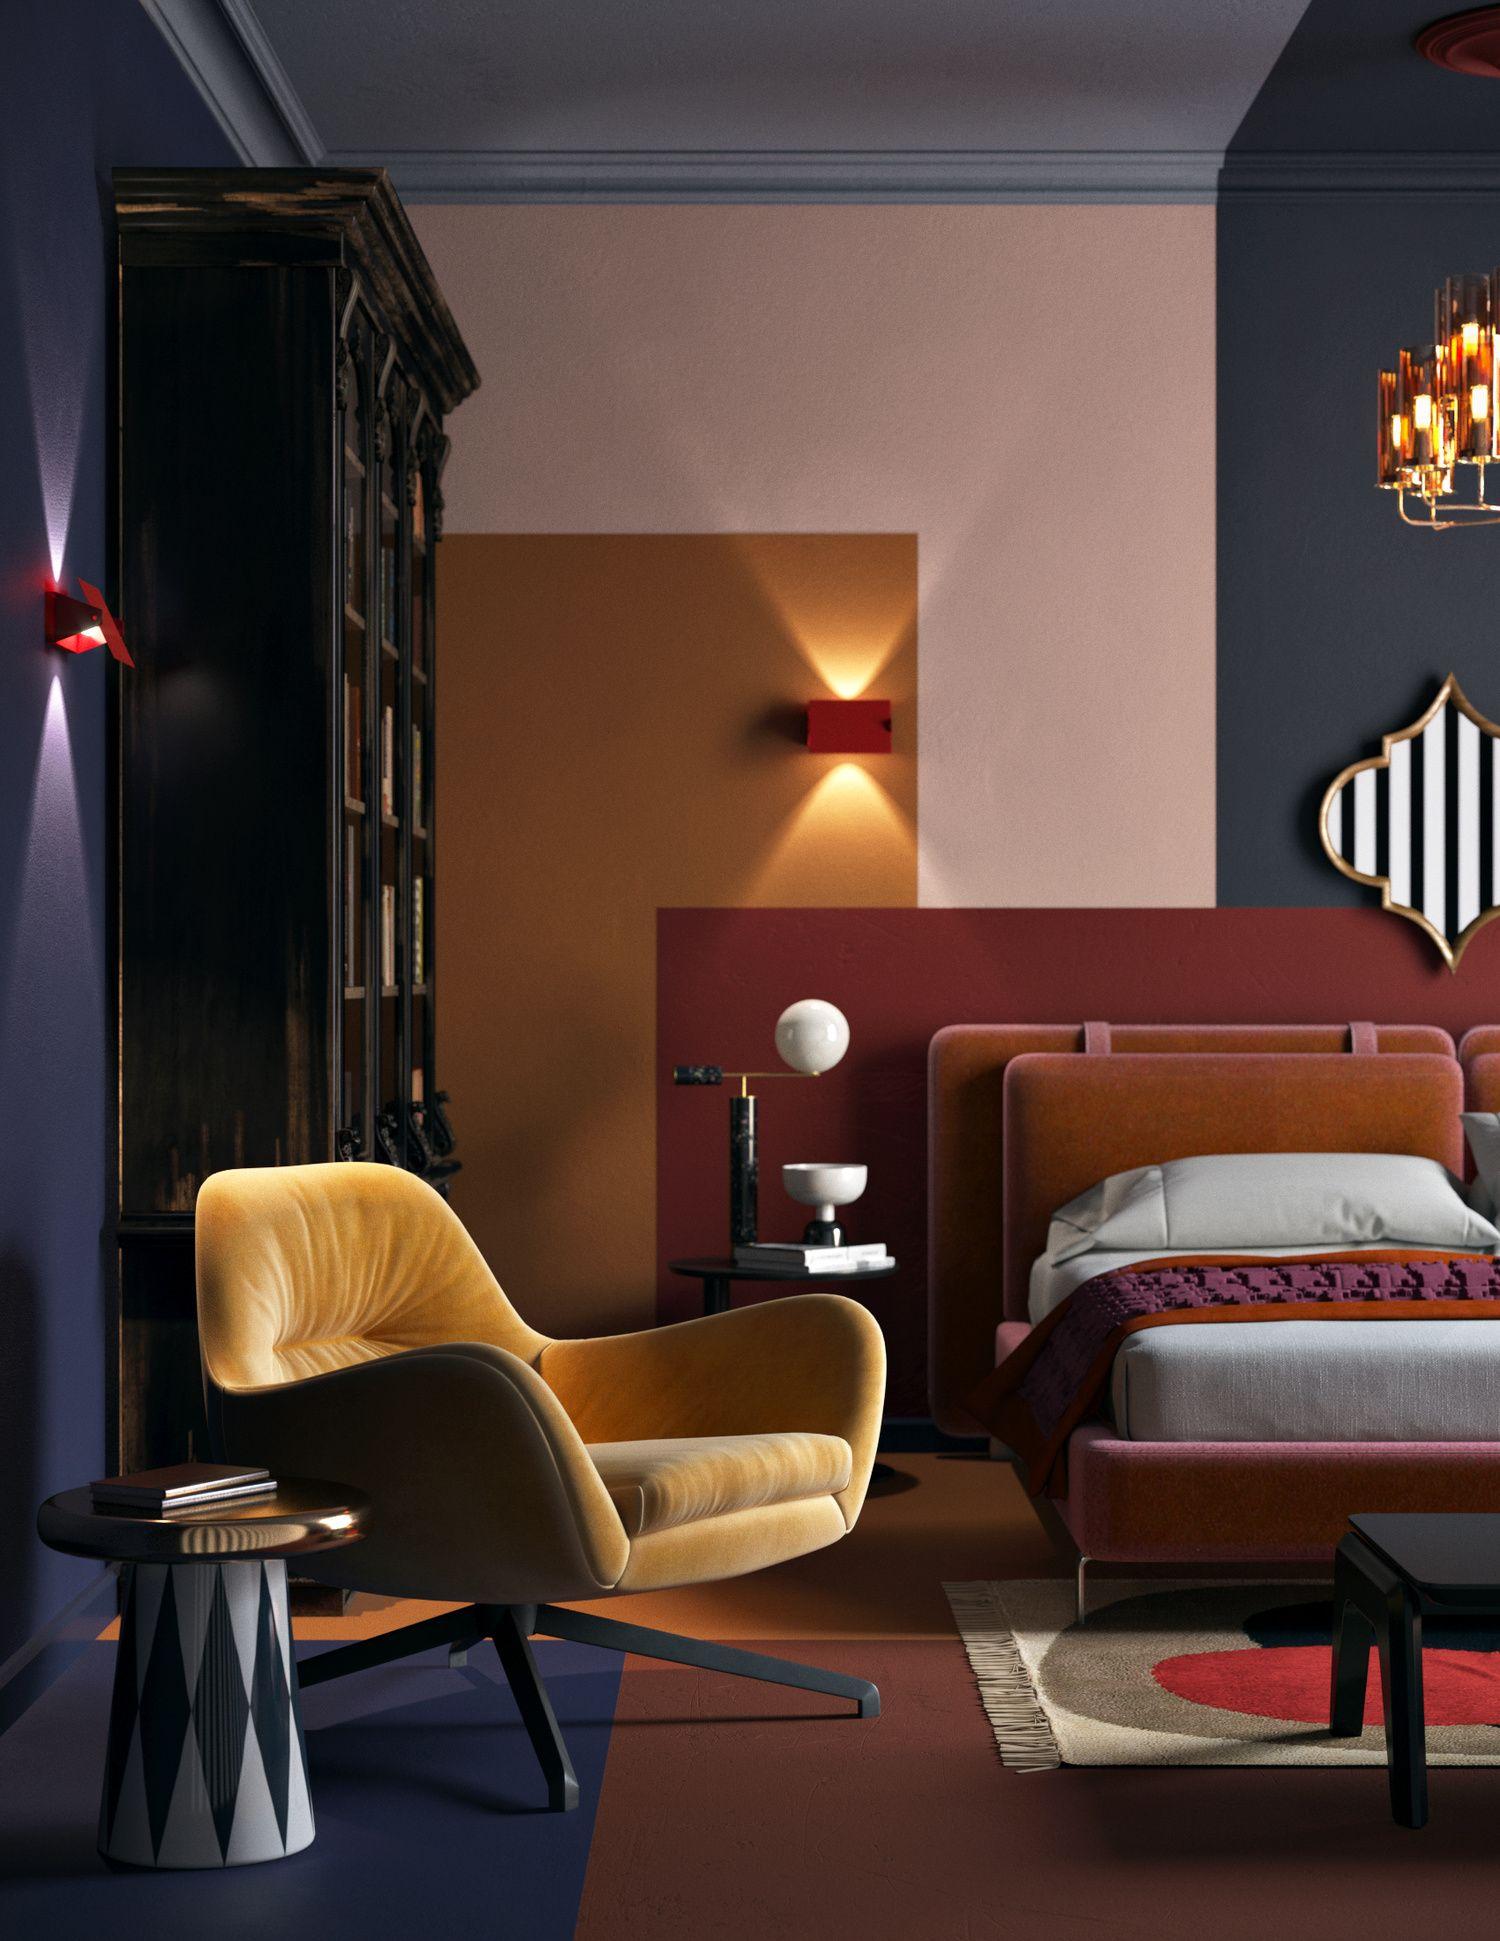 Modern interior design interior architecture luxury interior color inspiration trends 2018 home furniture couple room bedroom decor mater